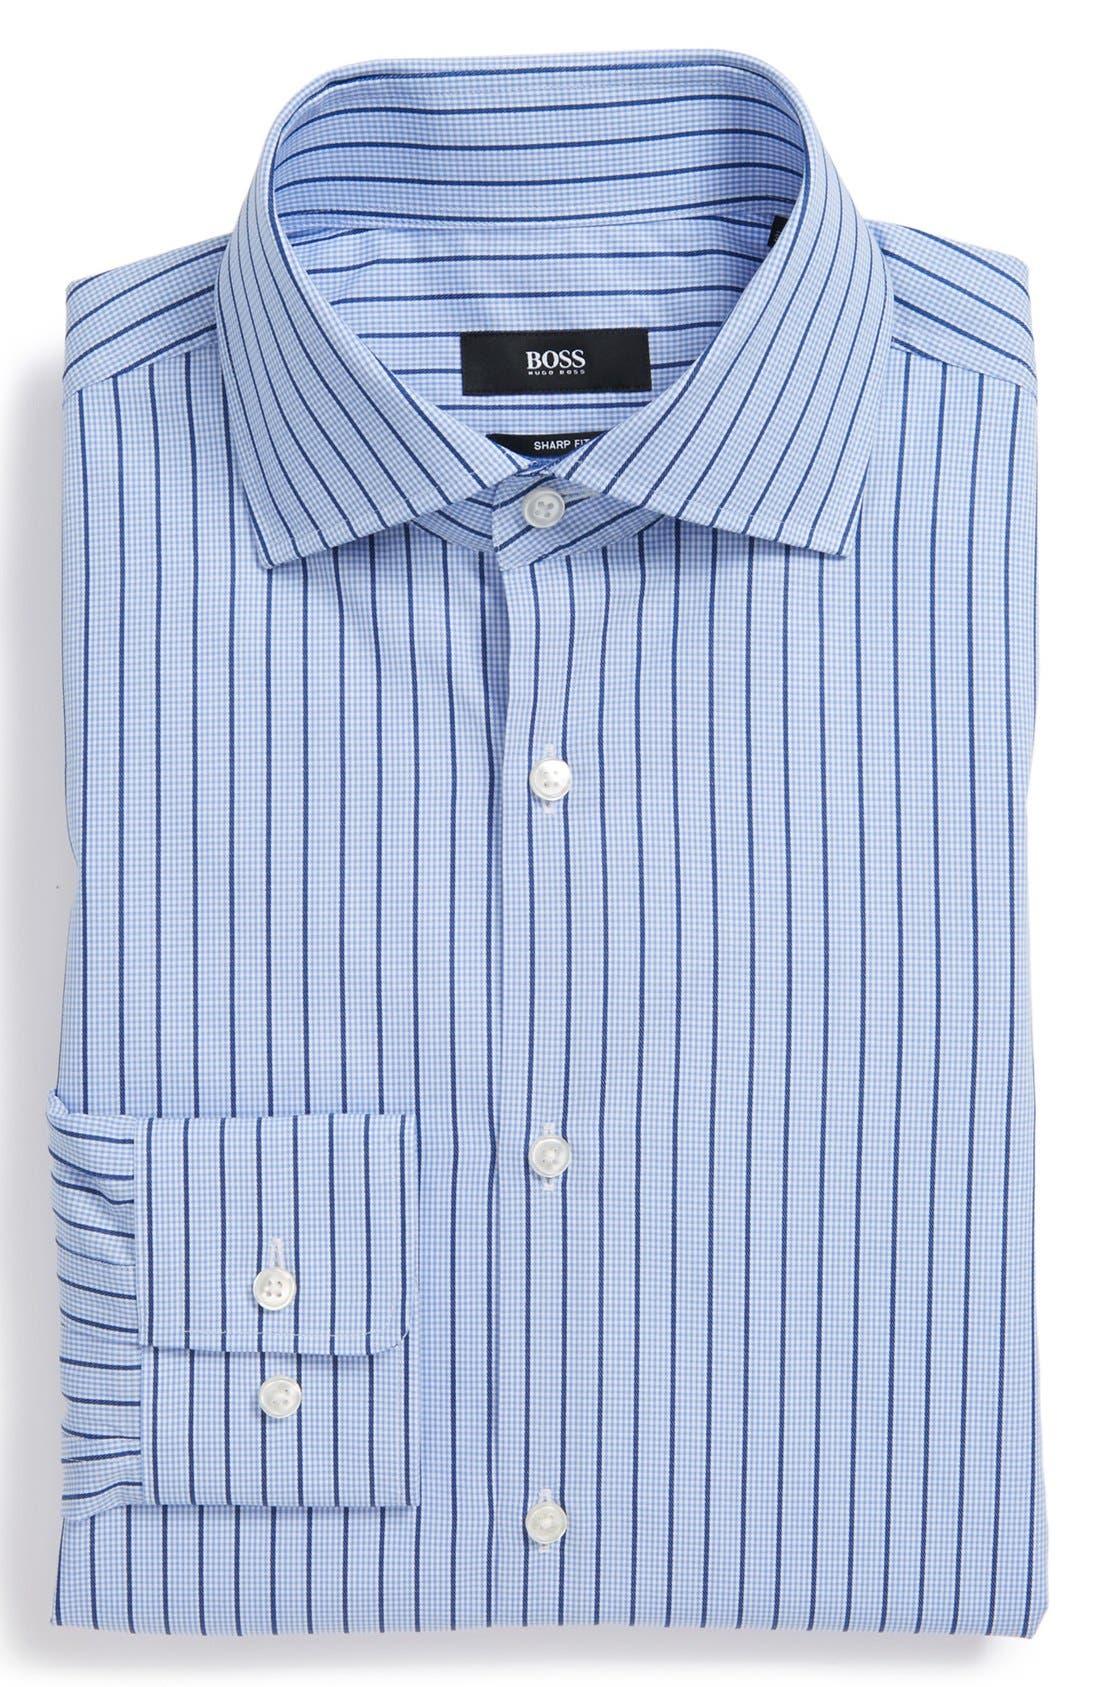 Main Image - BOSS HUGO BOSS 'Miles' Sharp Fit Dress Shirt